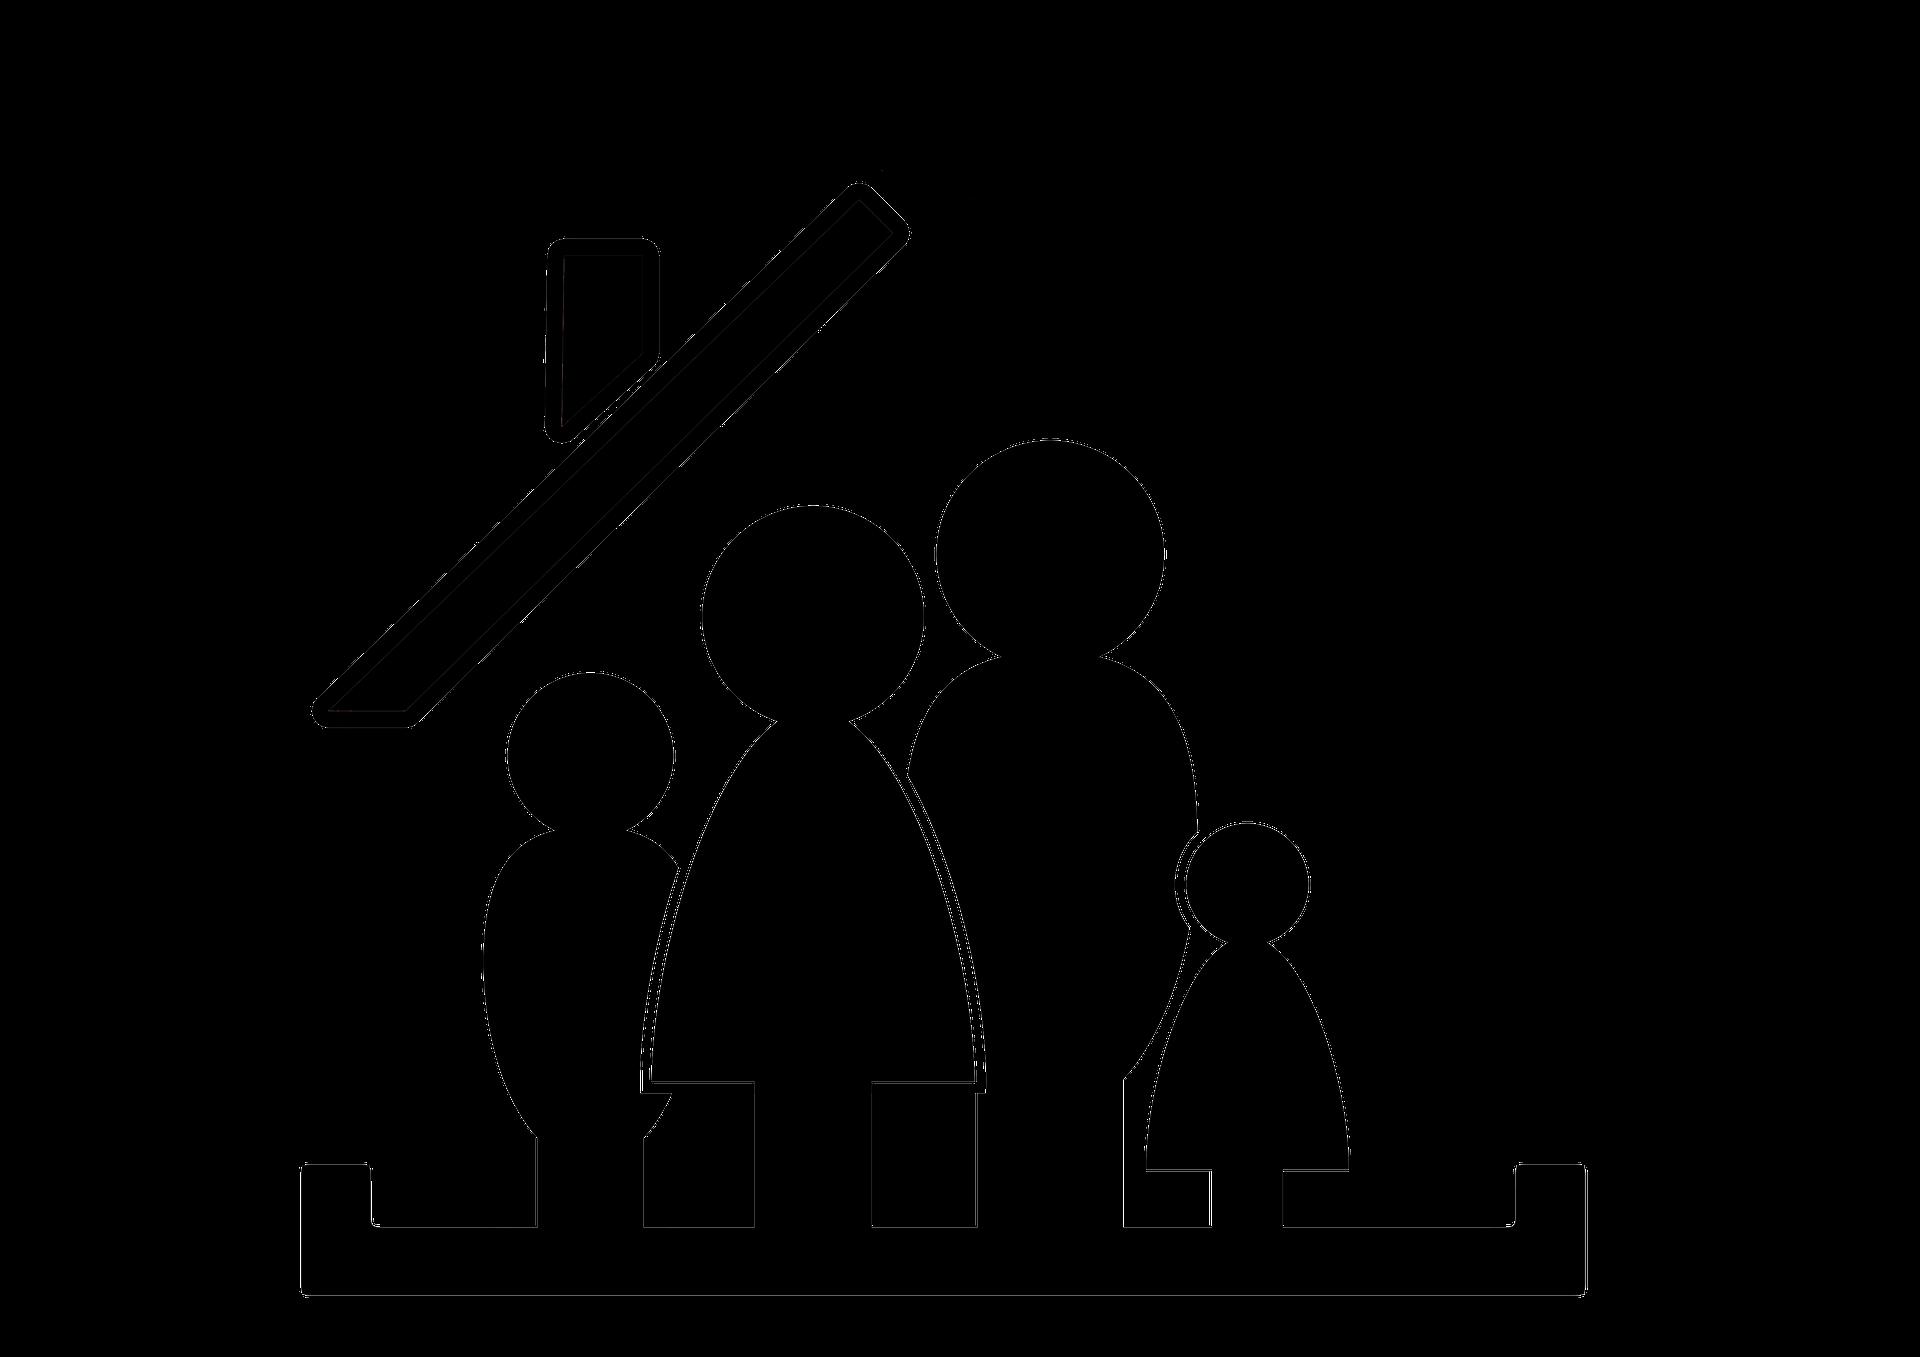 Imatge habitatge família